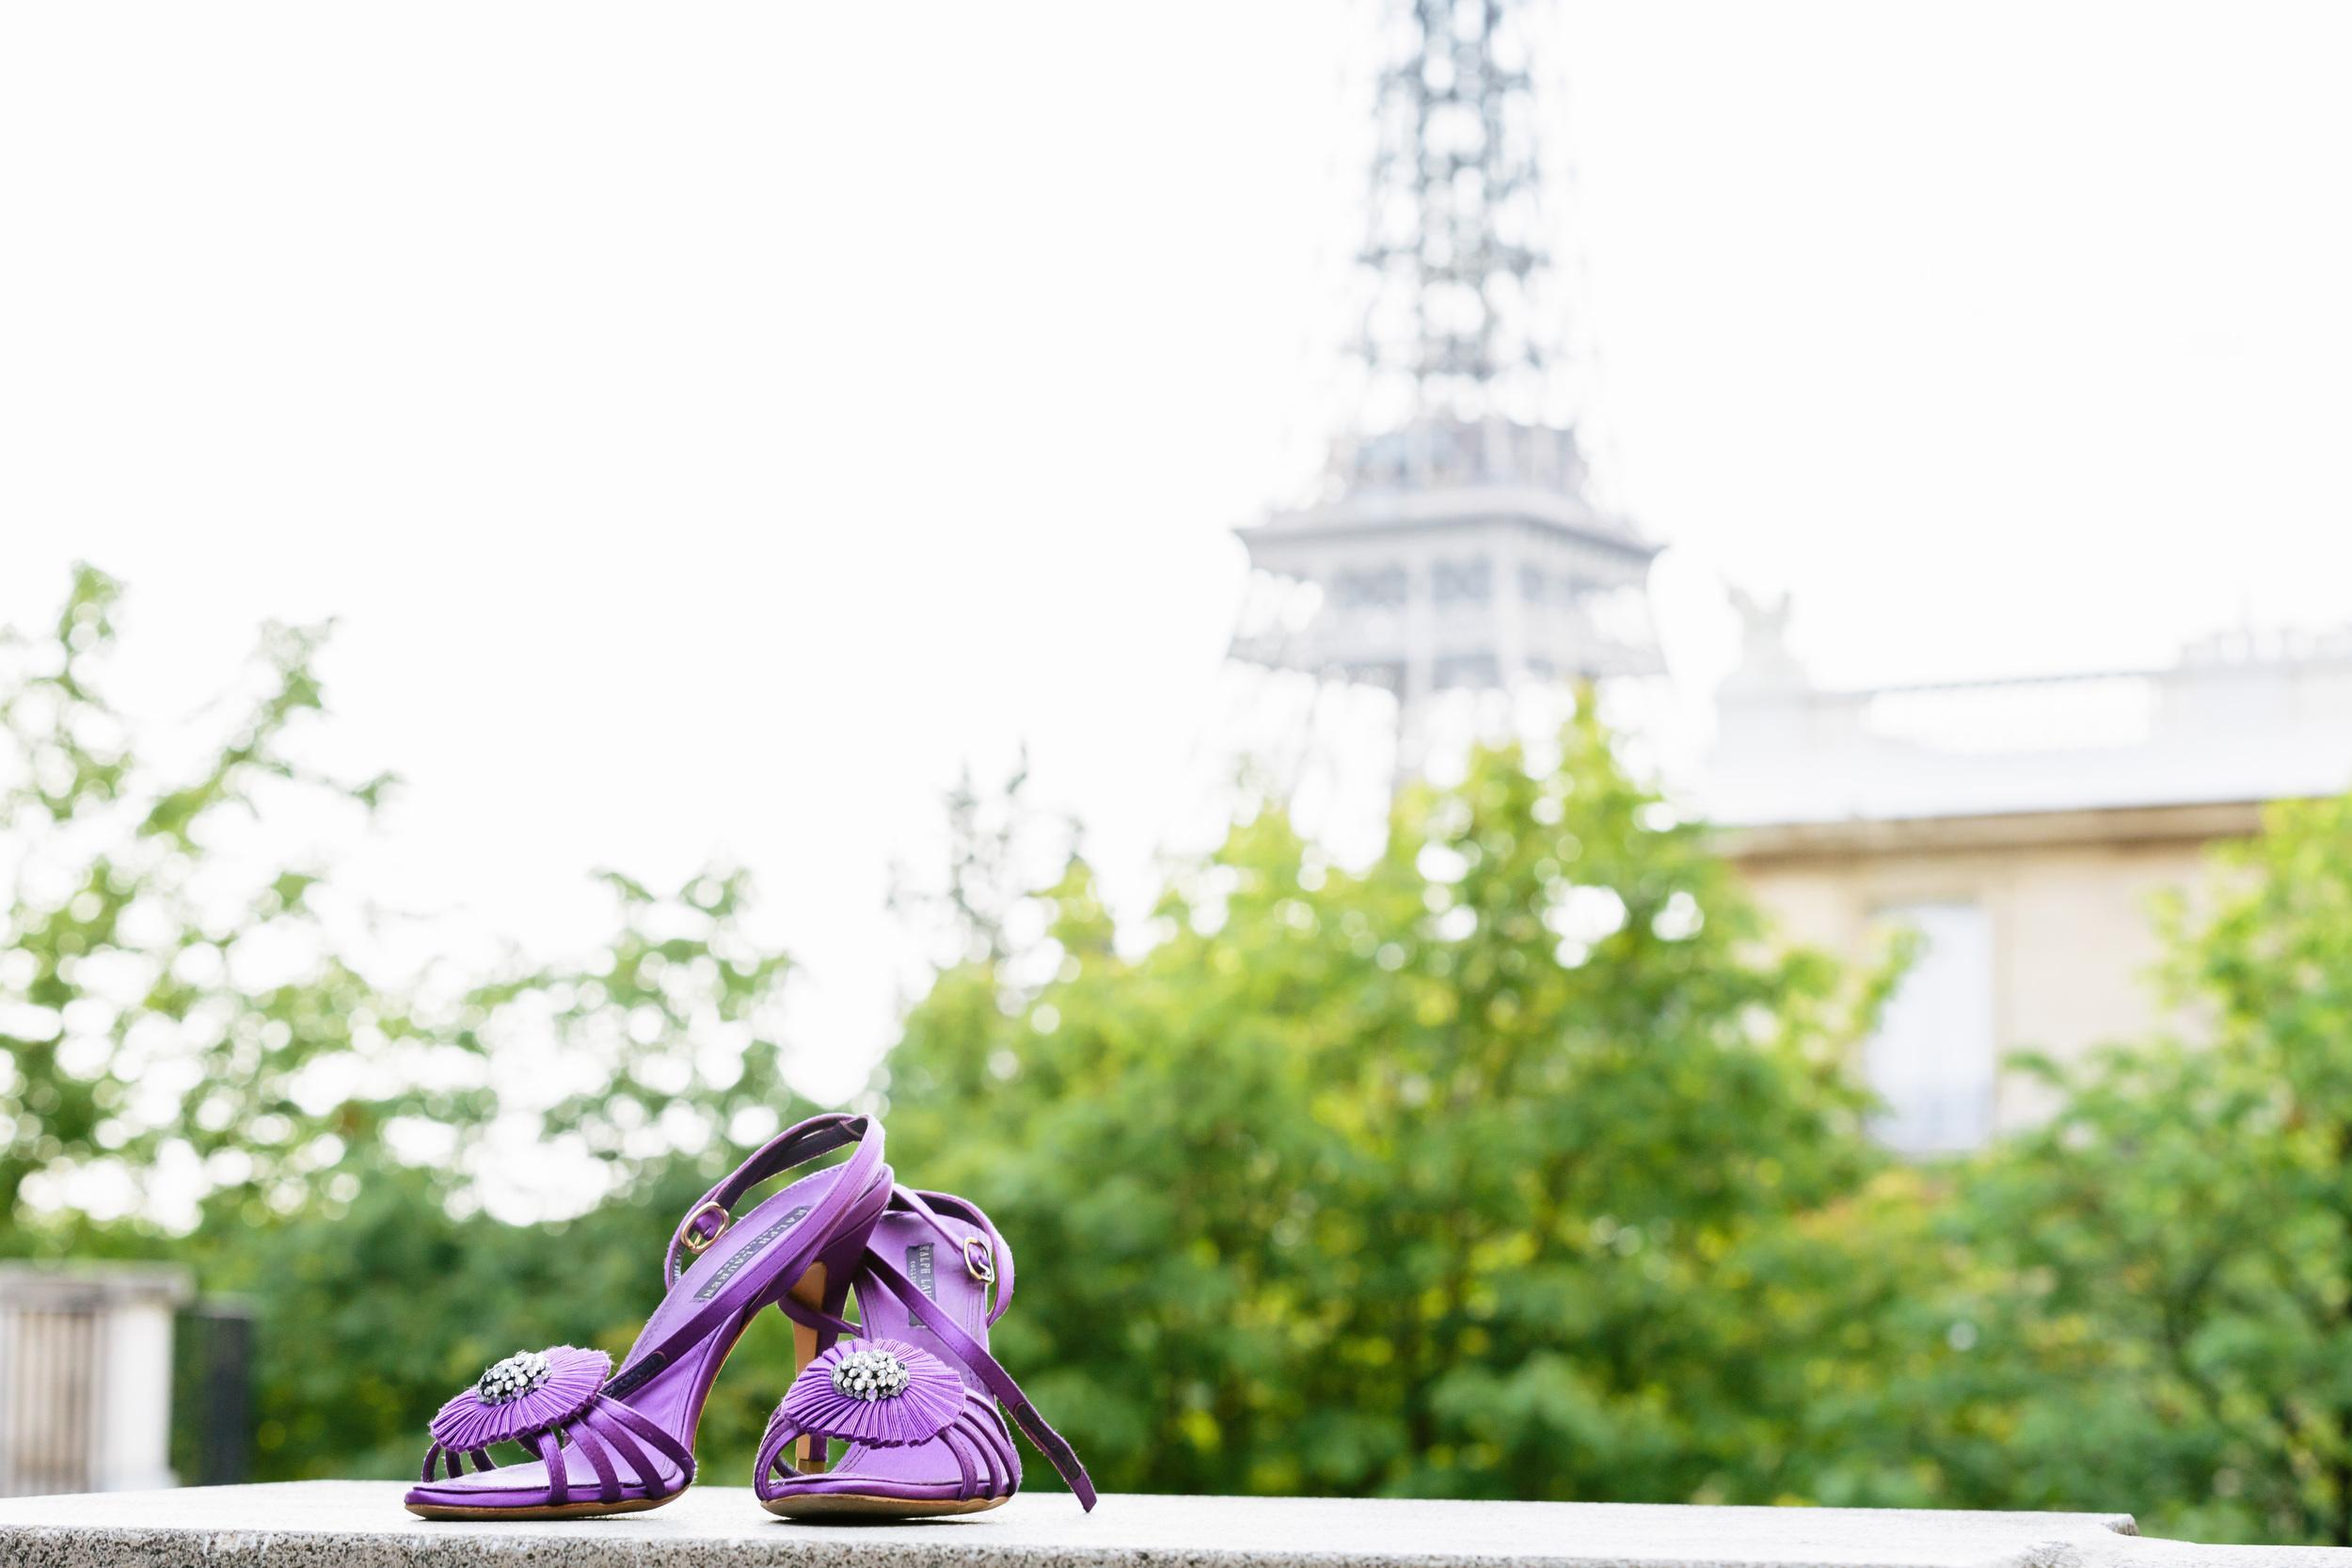 Photographer in Paris, Eiffel Tower, Ralph Lauren shoes, Birthday, personal branding, IheartParisfr